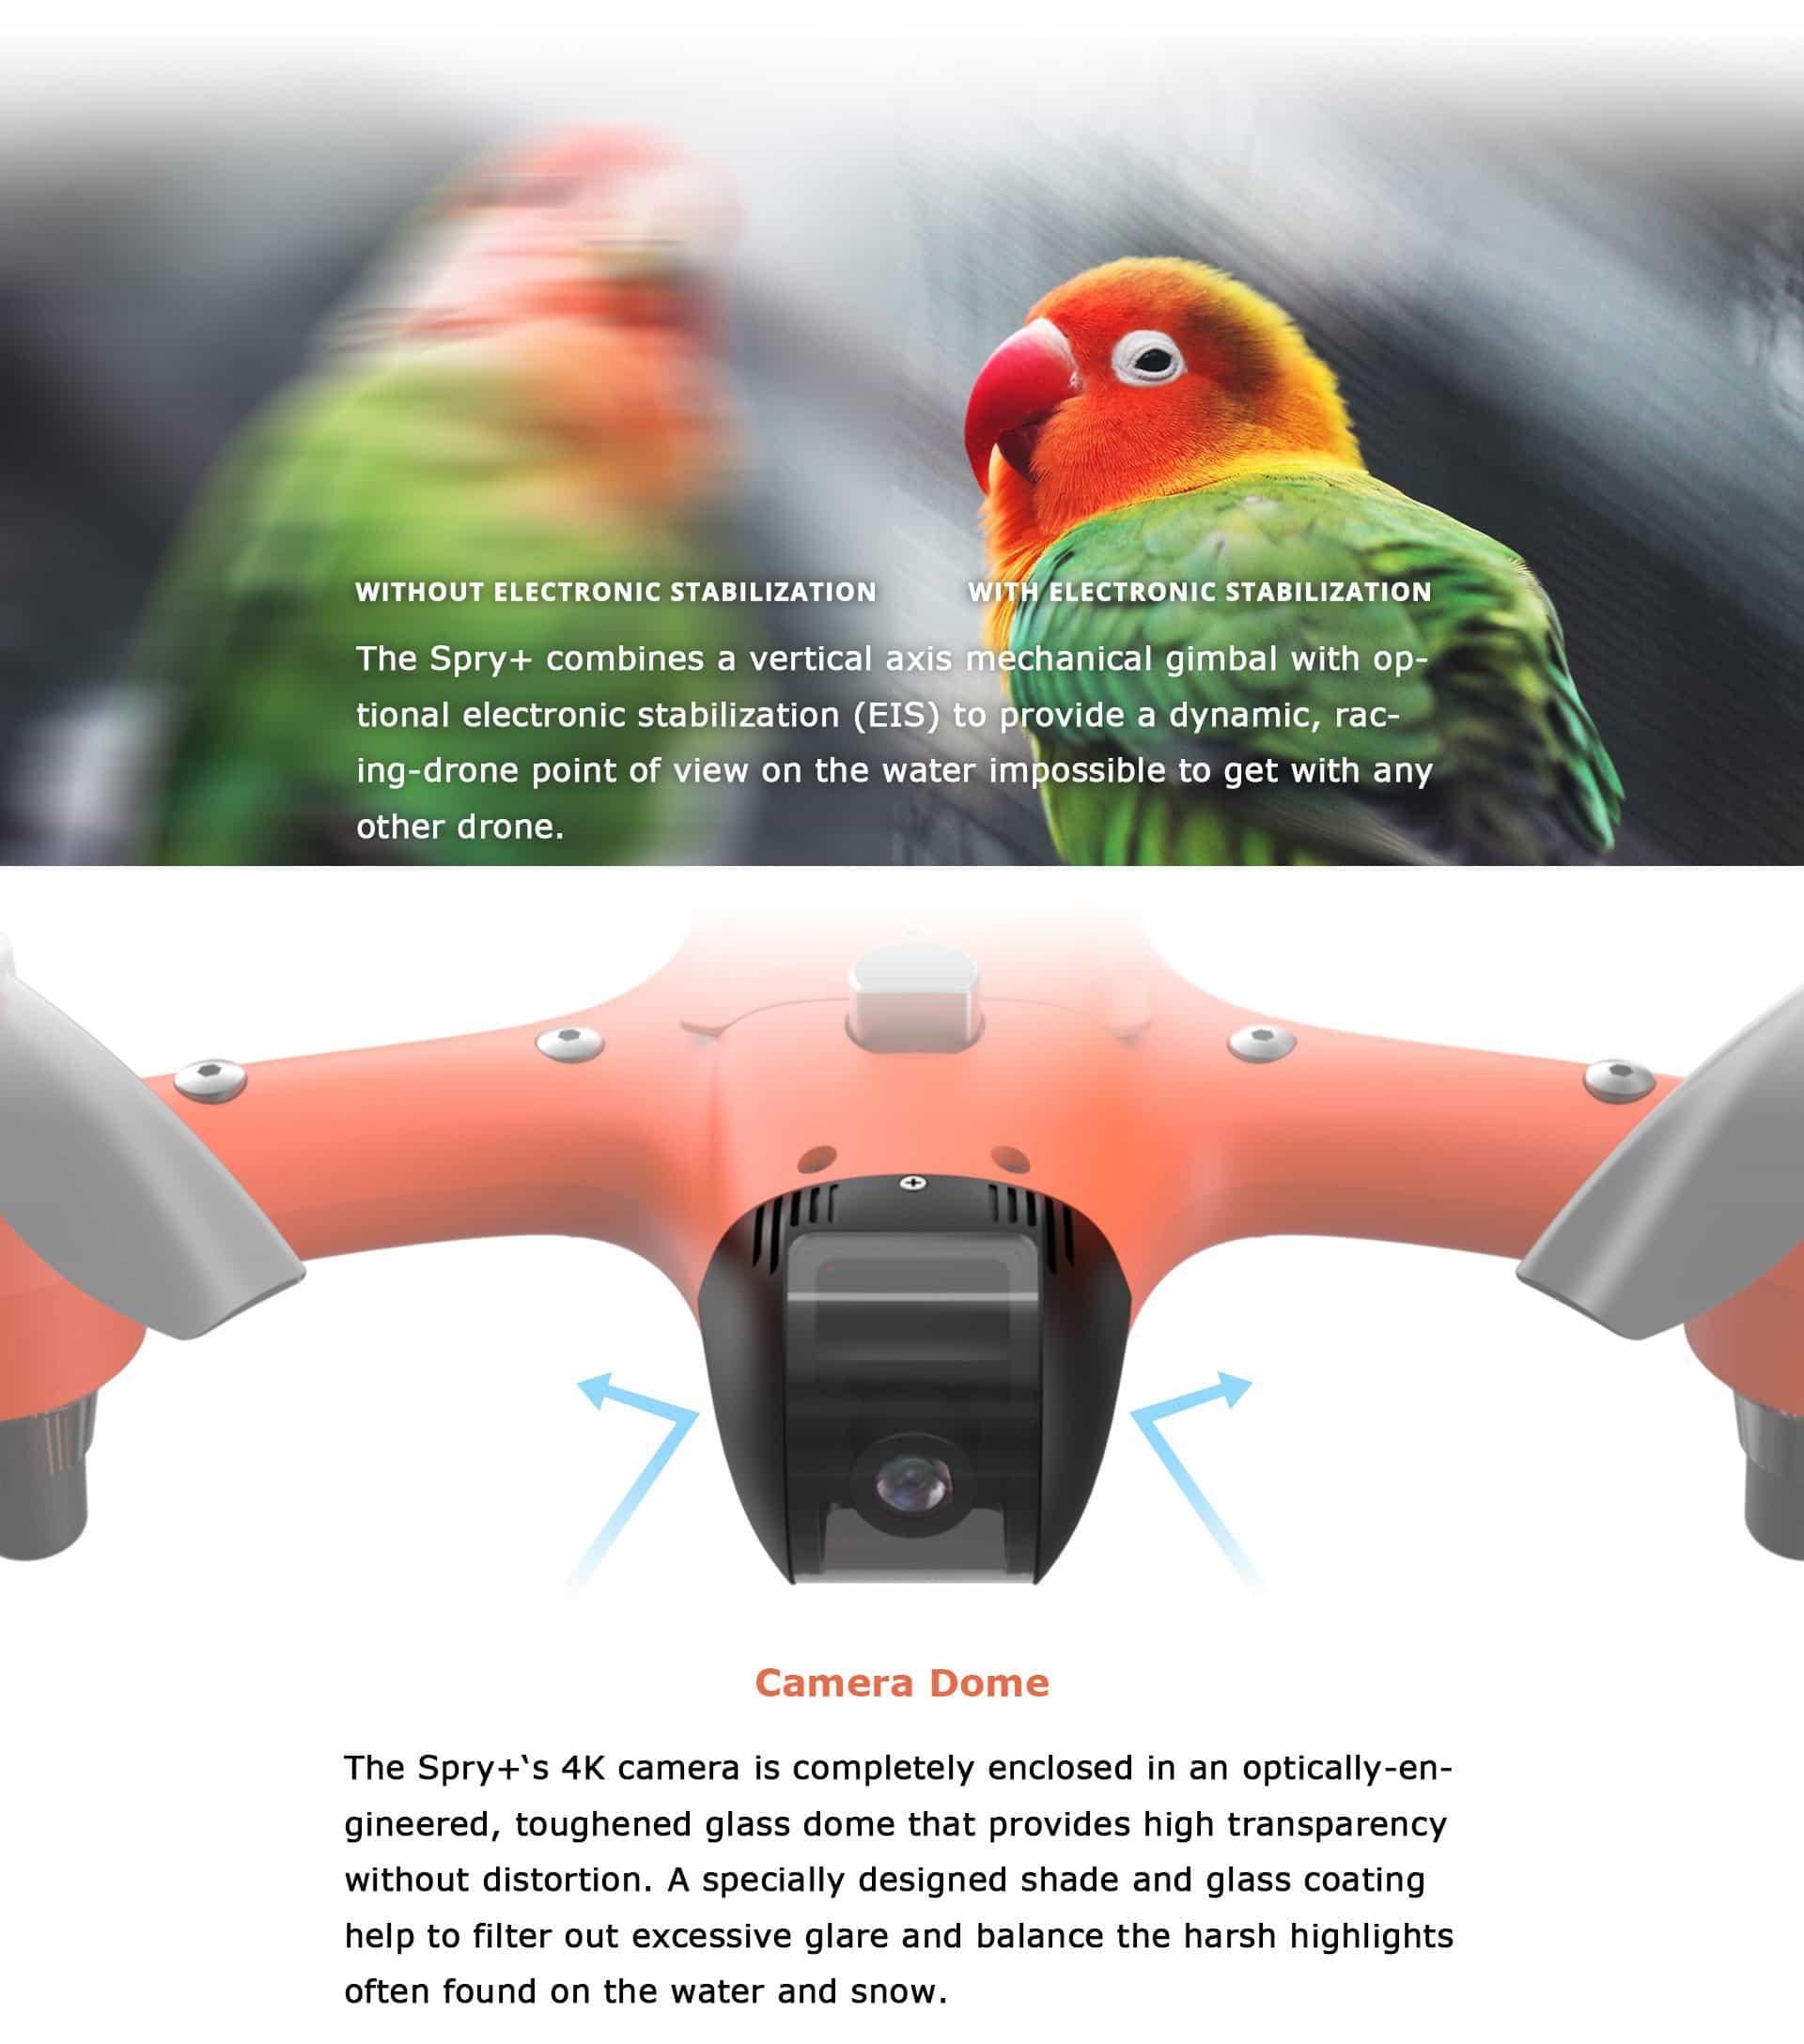 SwellPro - Spry+ Camera